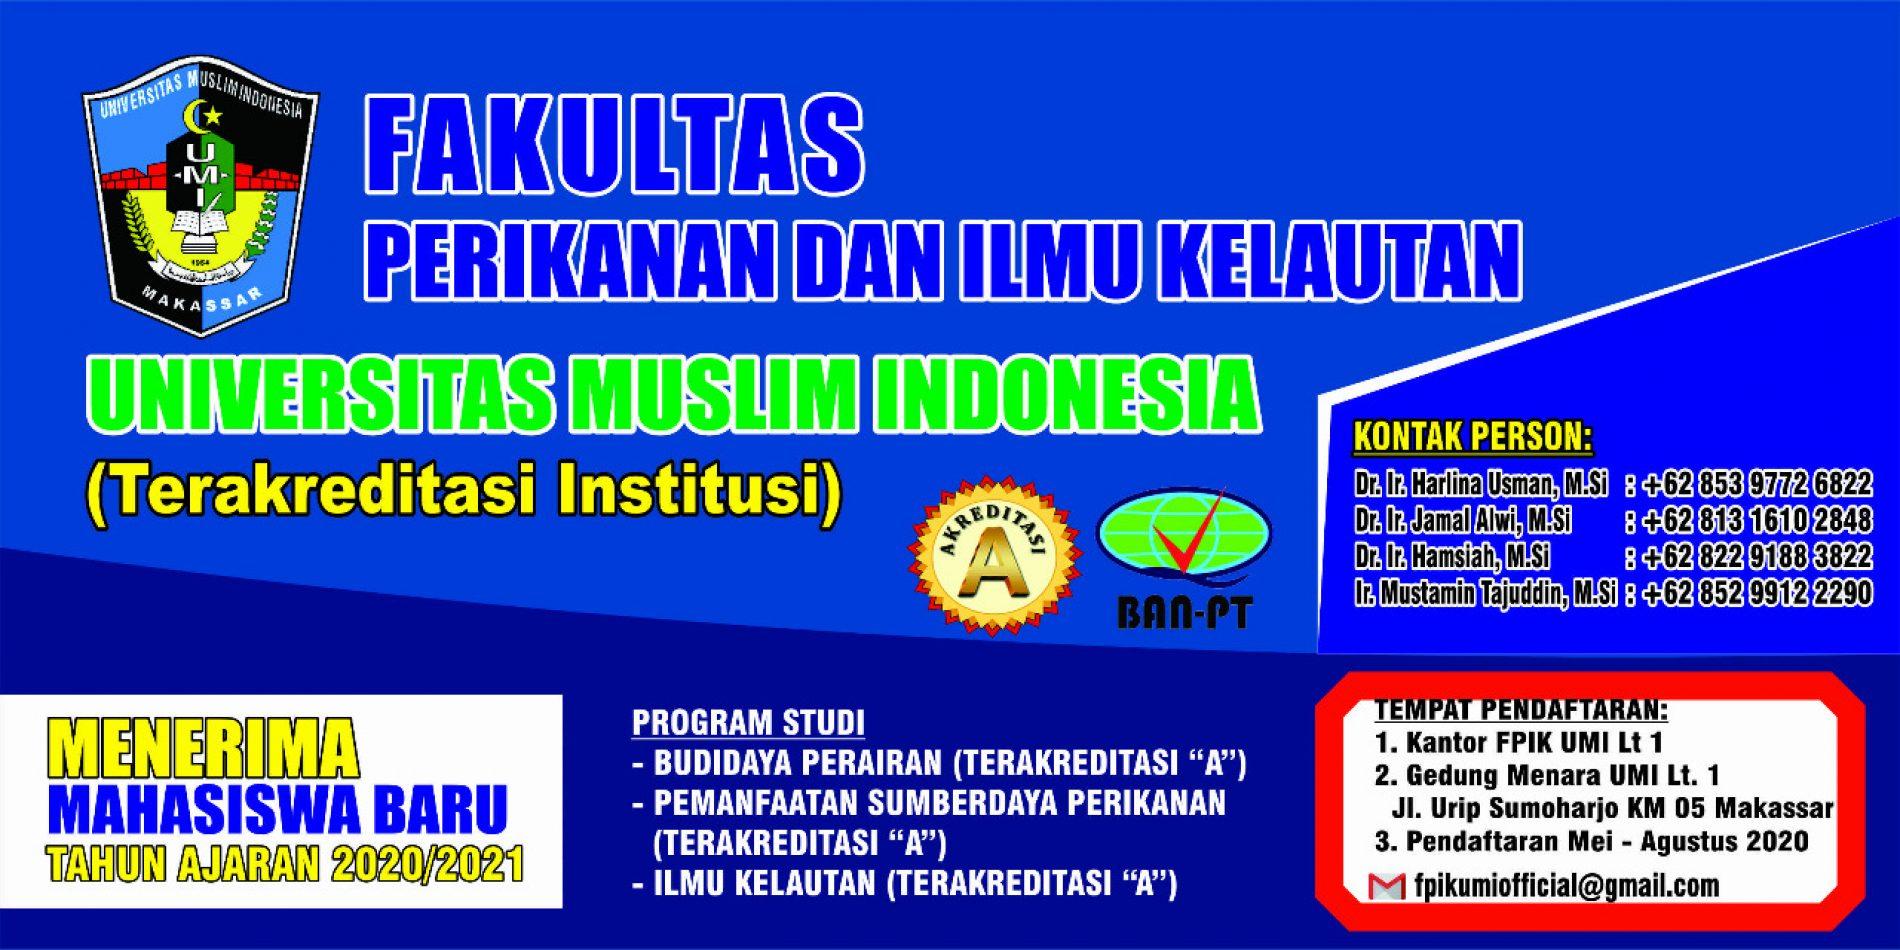 Pendaftaran Mahasiswa Baru Fakultas Perikanan dan Ilmu Kelautan UMI Tahun 2020/2021